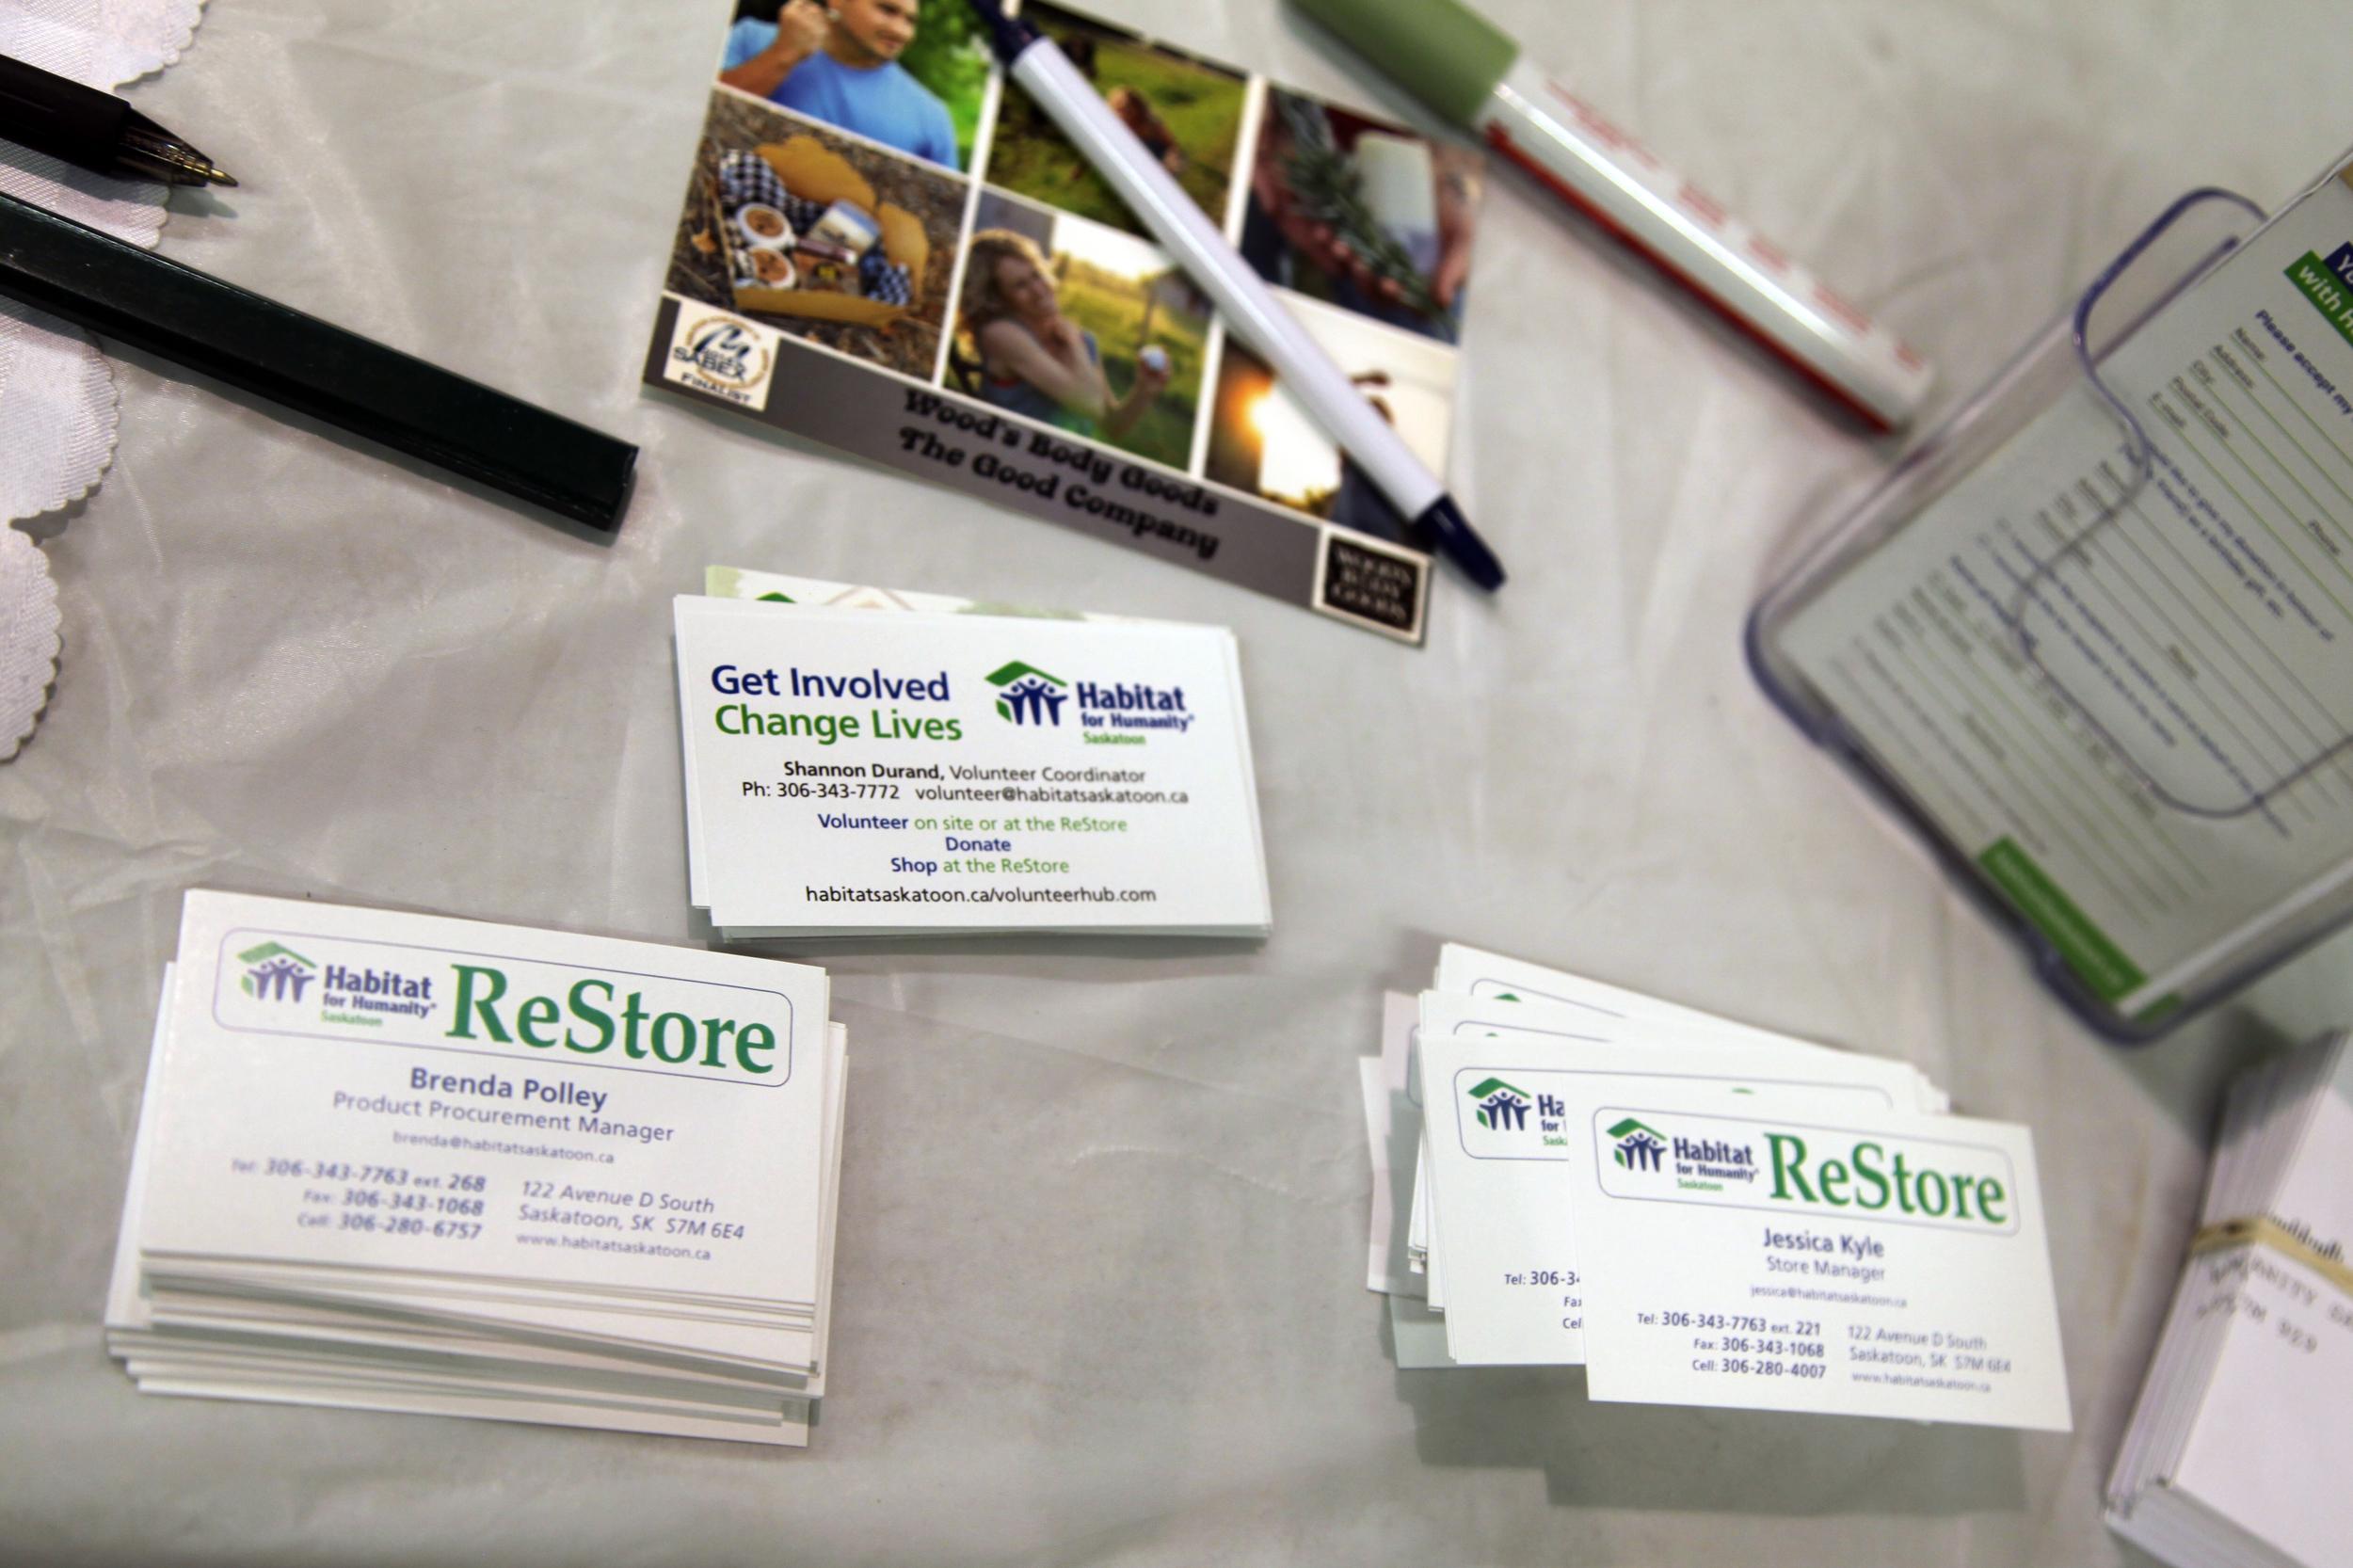 habitat restore.JPG